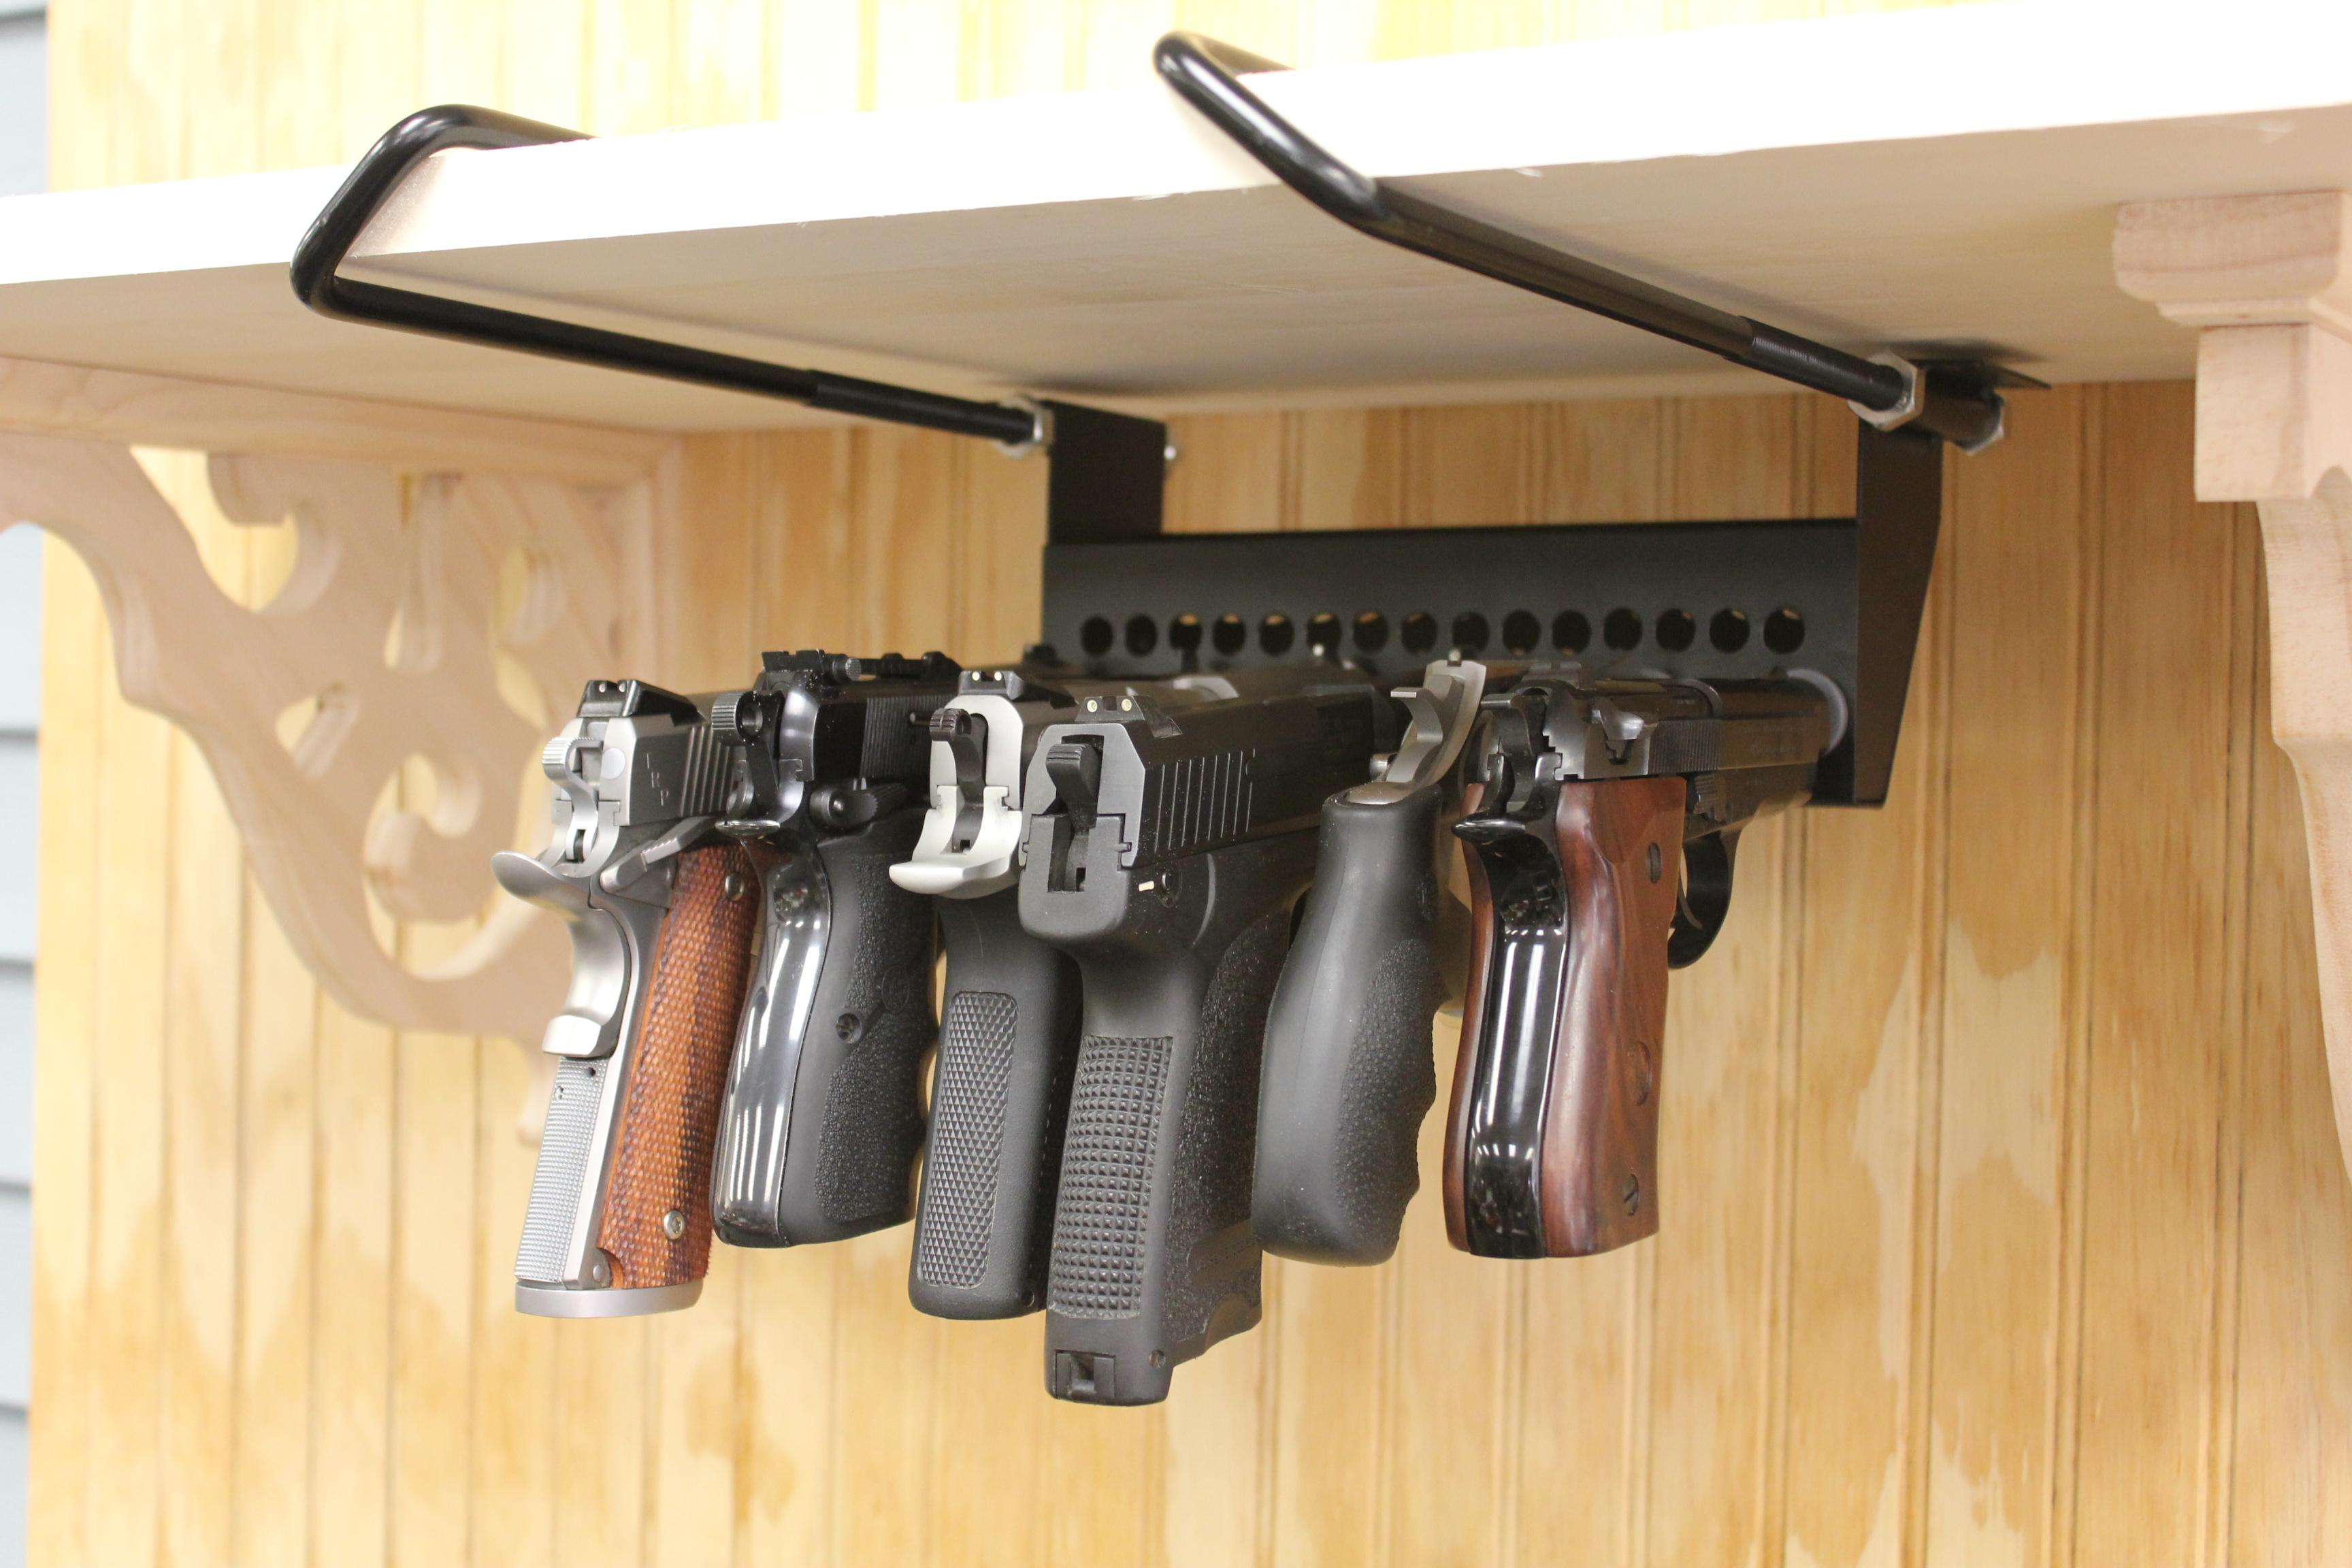 Hyskore 174 Announces The Six Gun Speed Rack The Ultimate